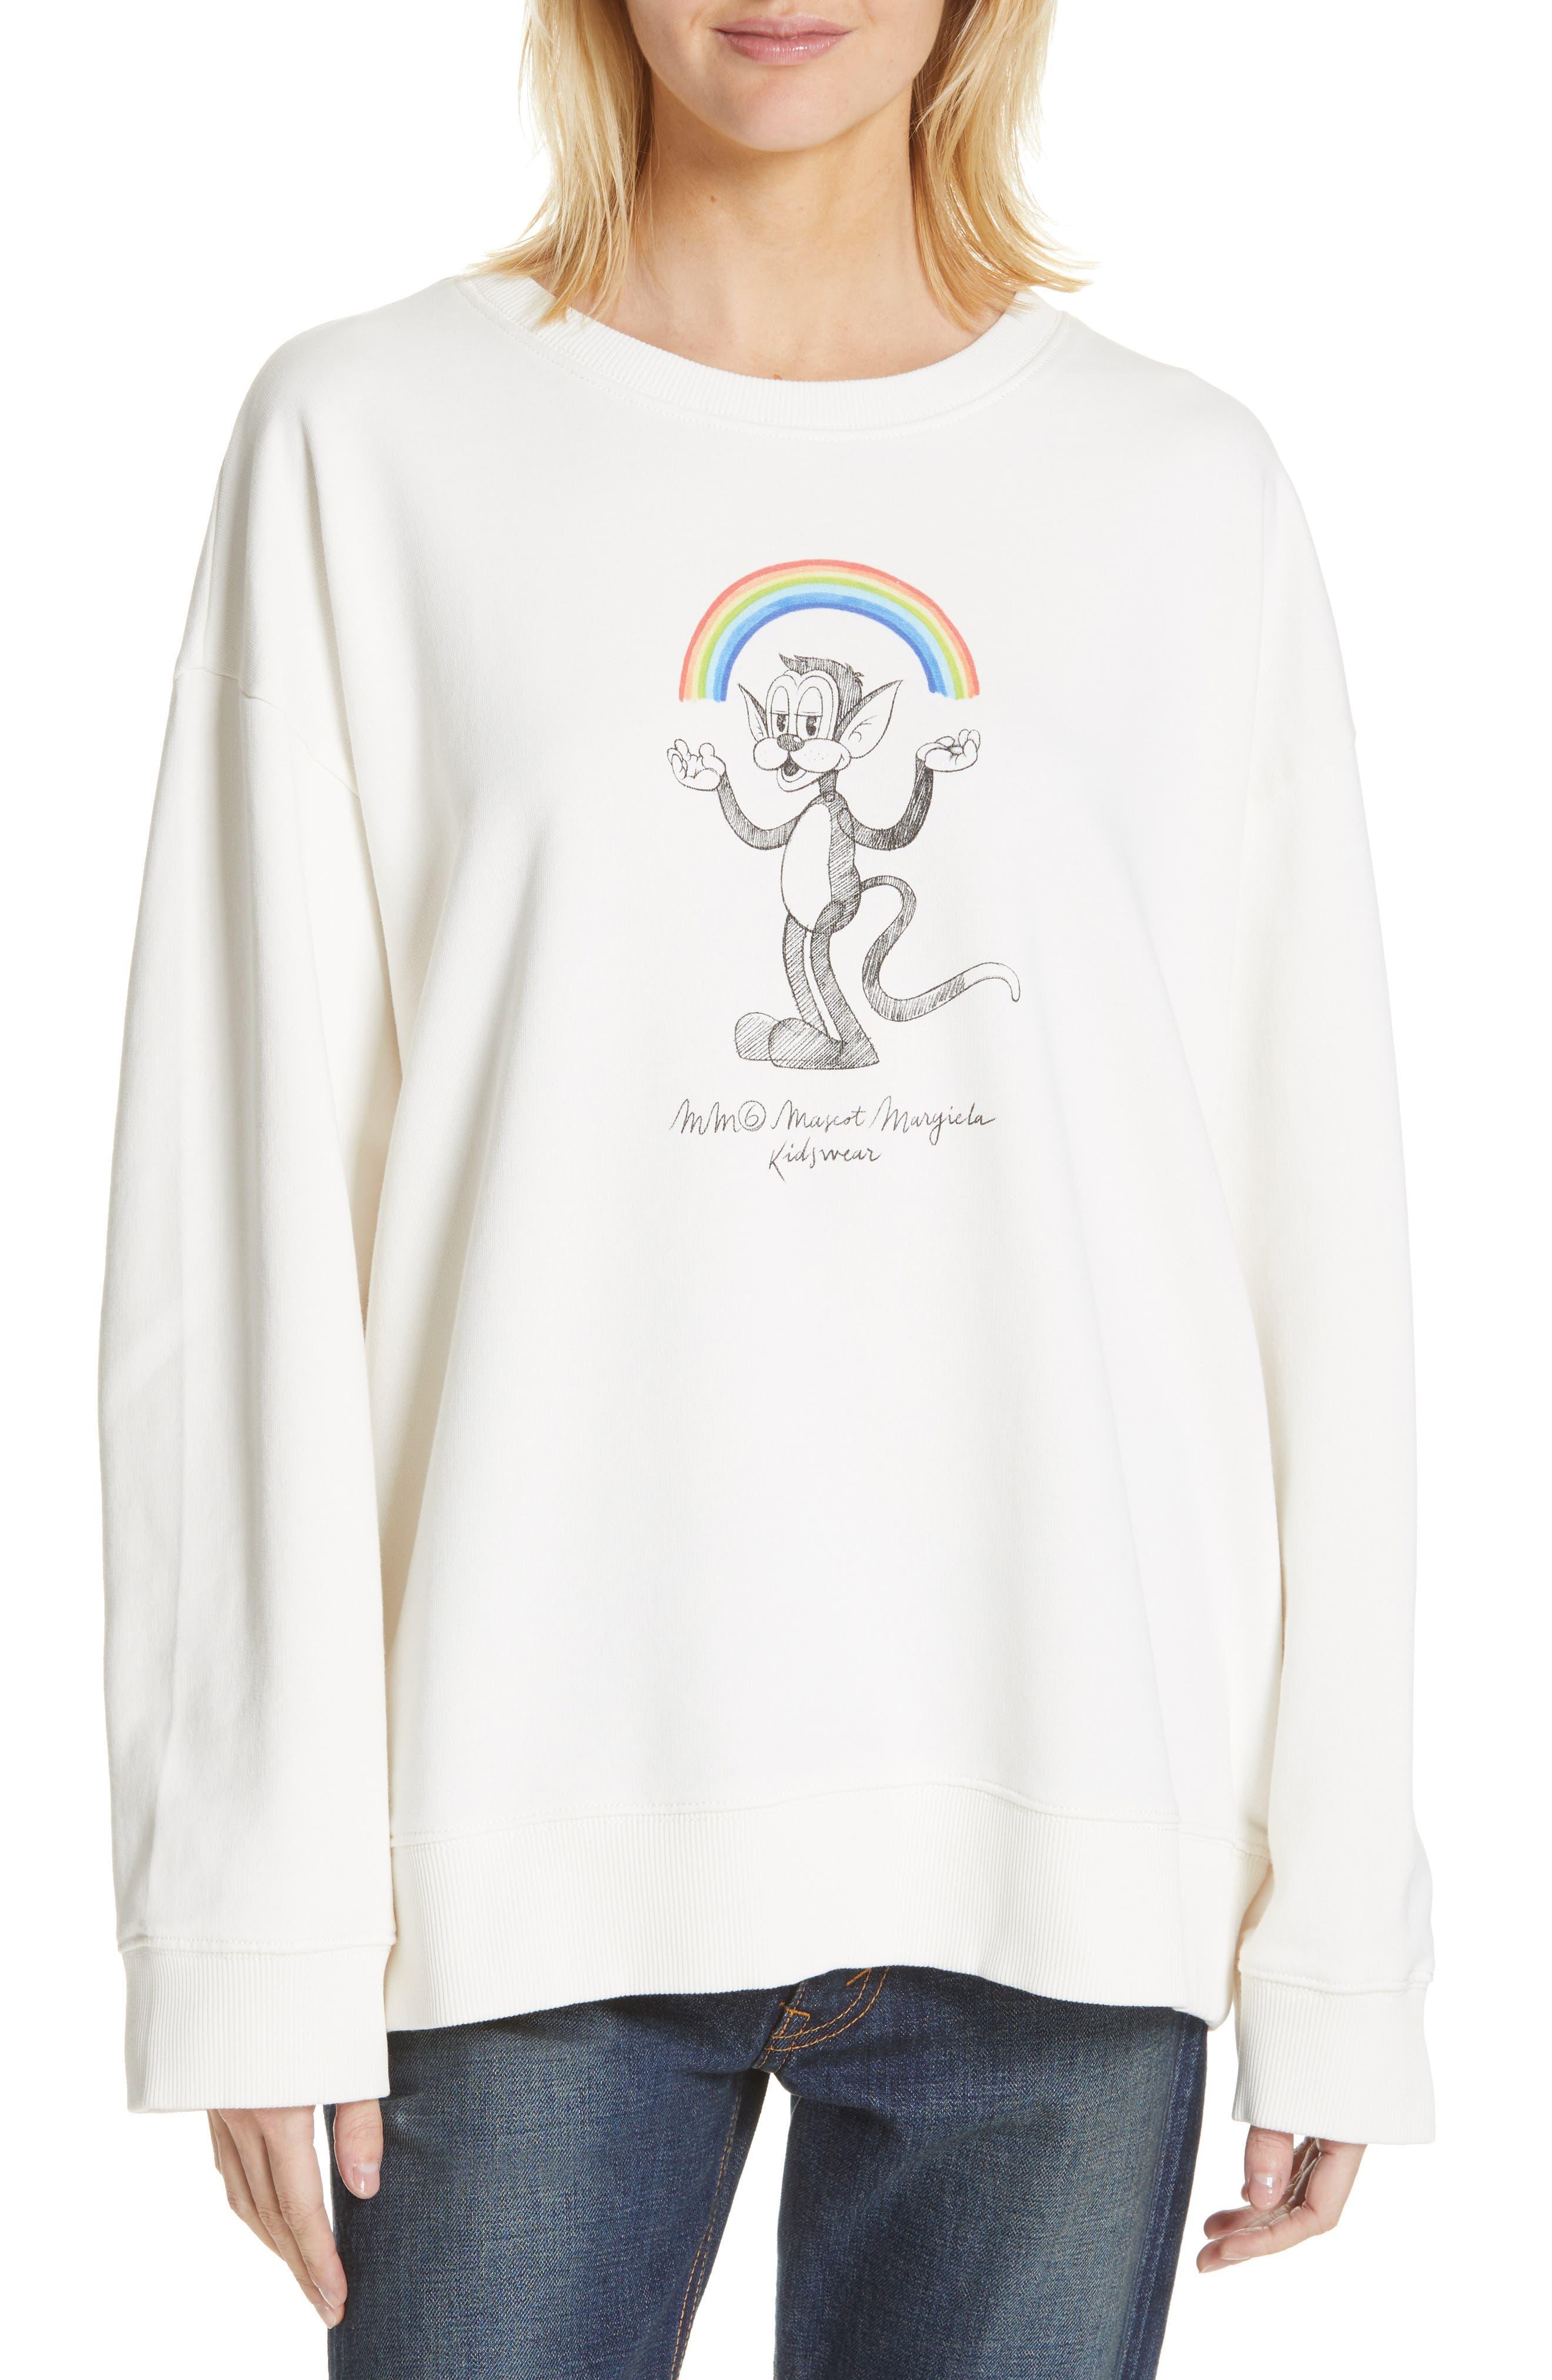 MM6 MAISON MARGIELA,                             Kidswear Mascot Graphic Sweatshirt,                             Main thumbnail 1, color,                             OFF WHITE